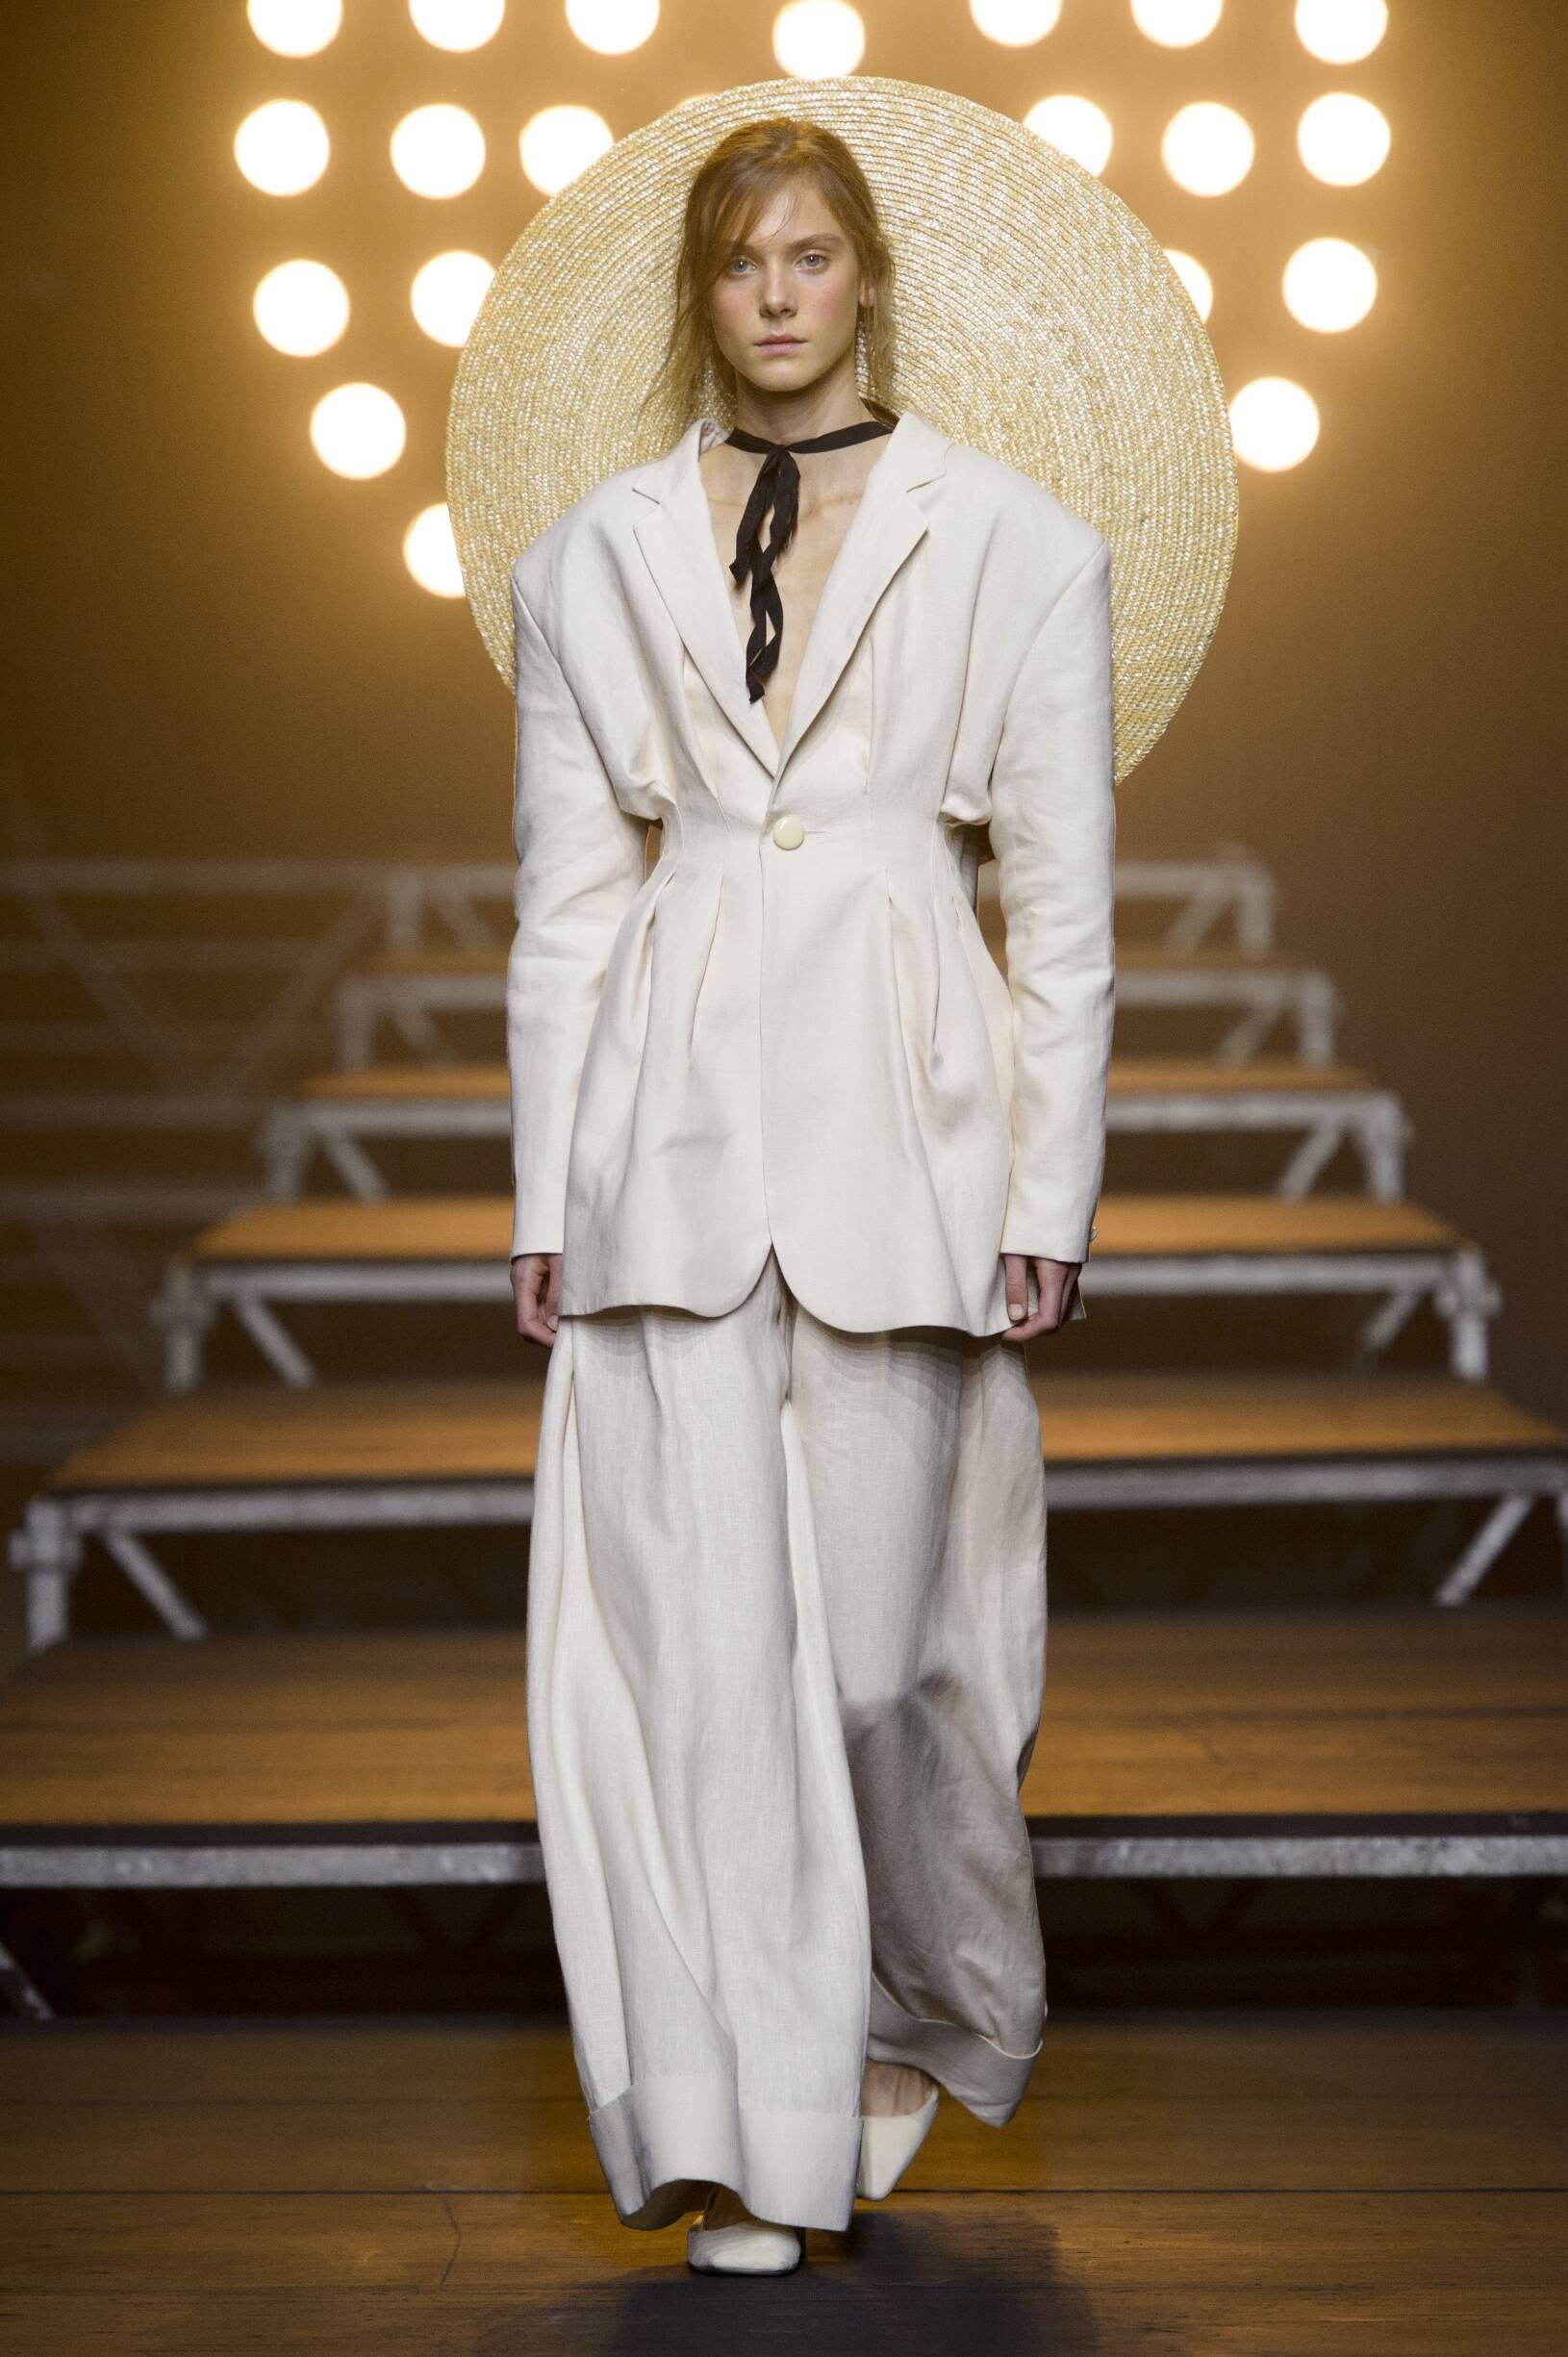 Fashion Model Jacquemus Catwalk